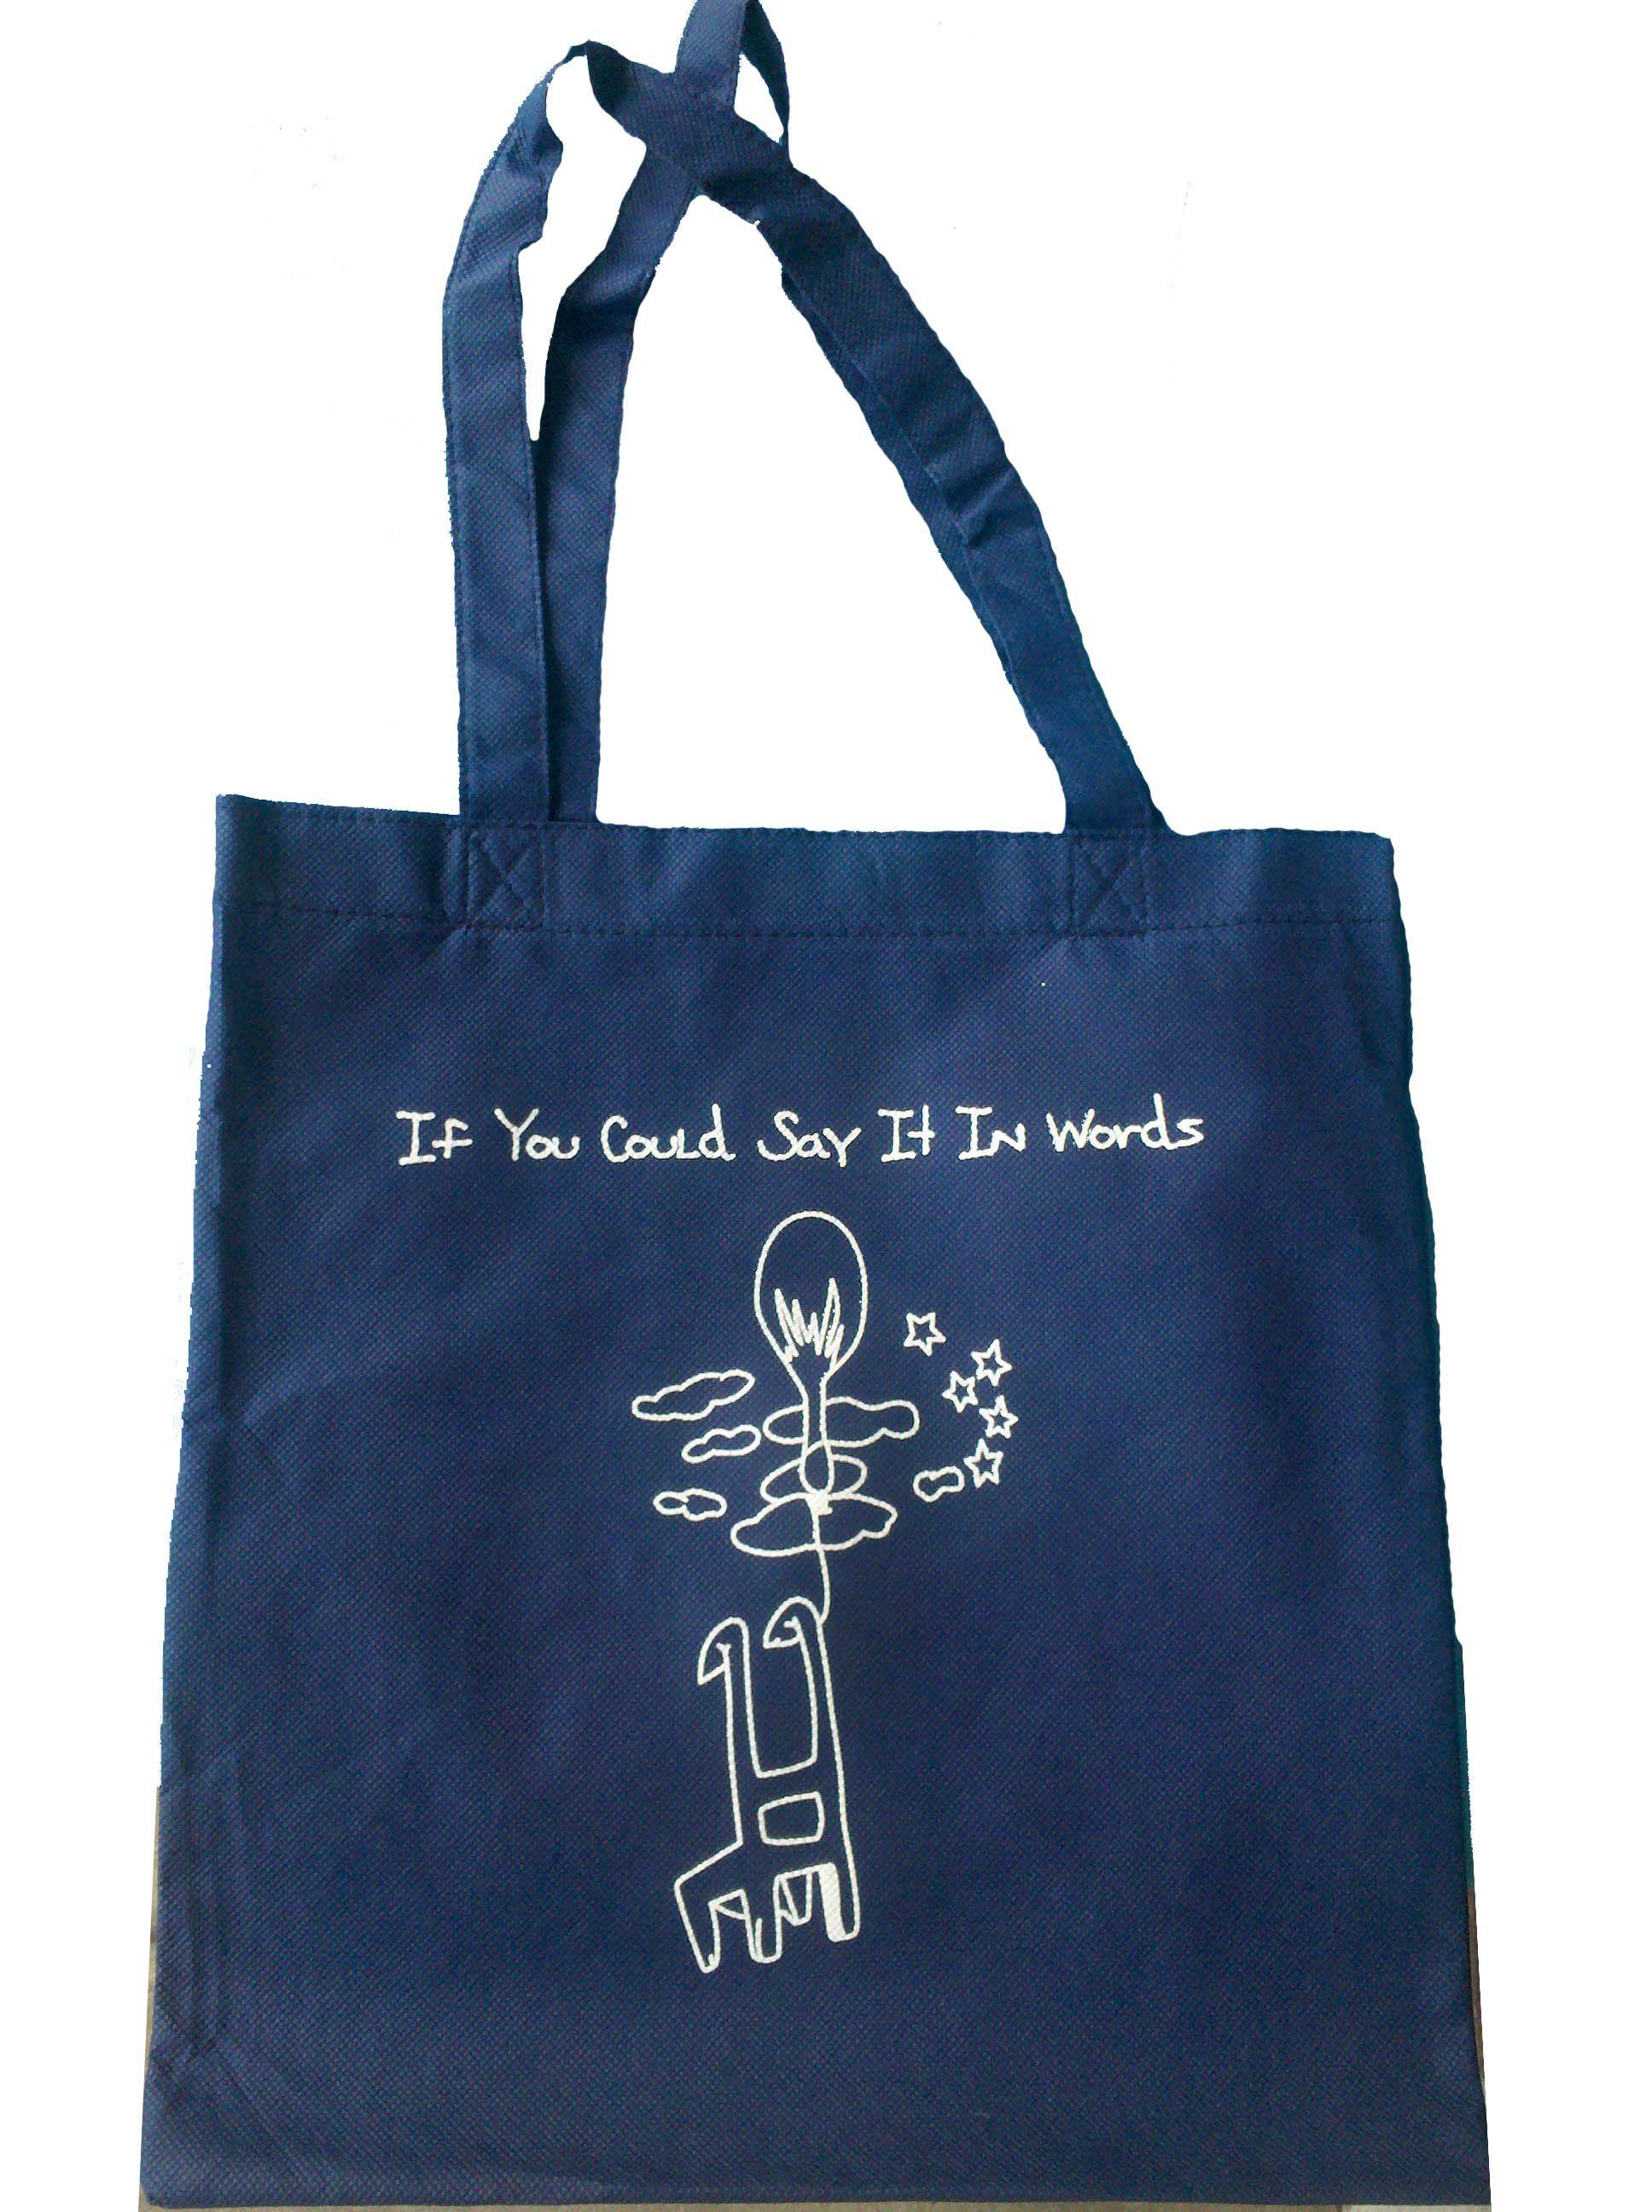 Eco-Friendly Tote Bag -http://uncompromisedcreative.com